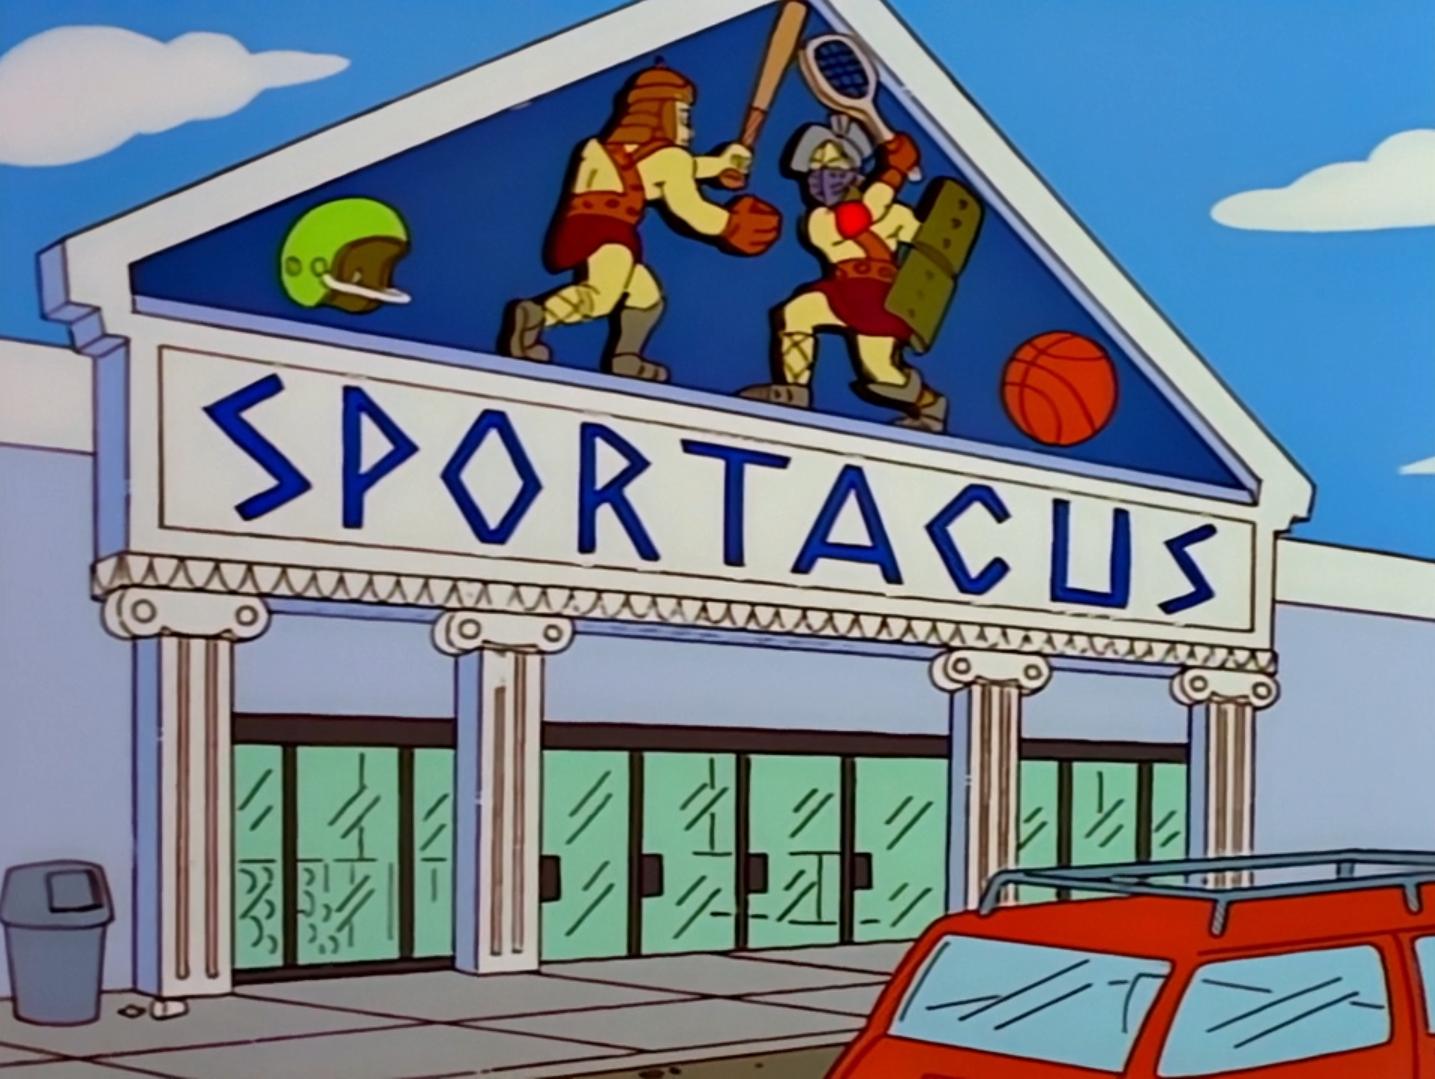 Sportacus.png